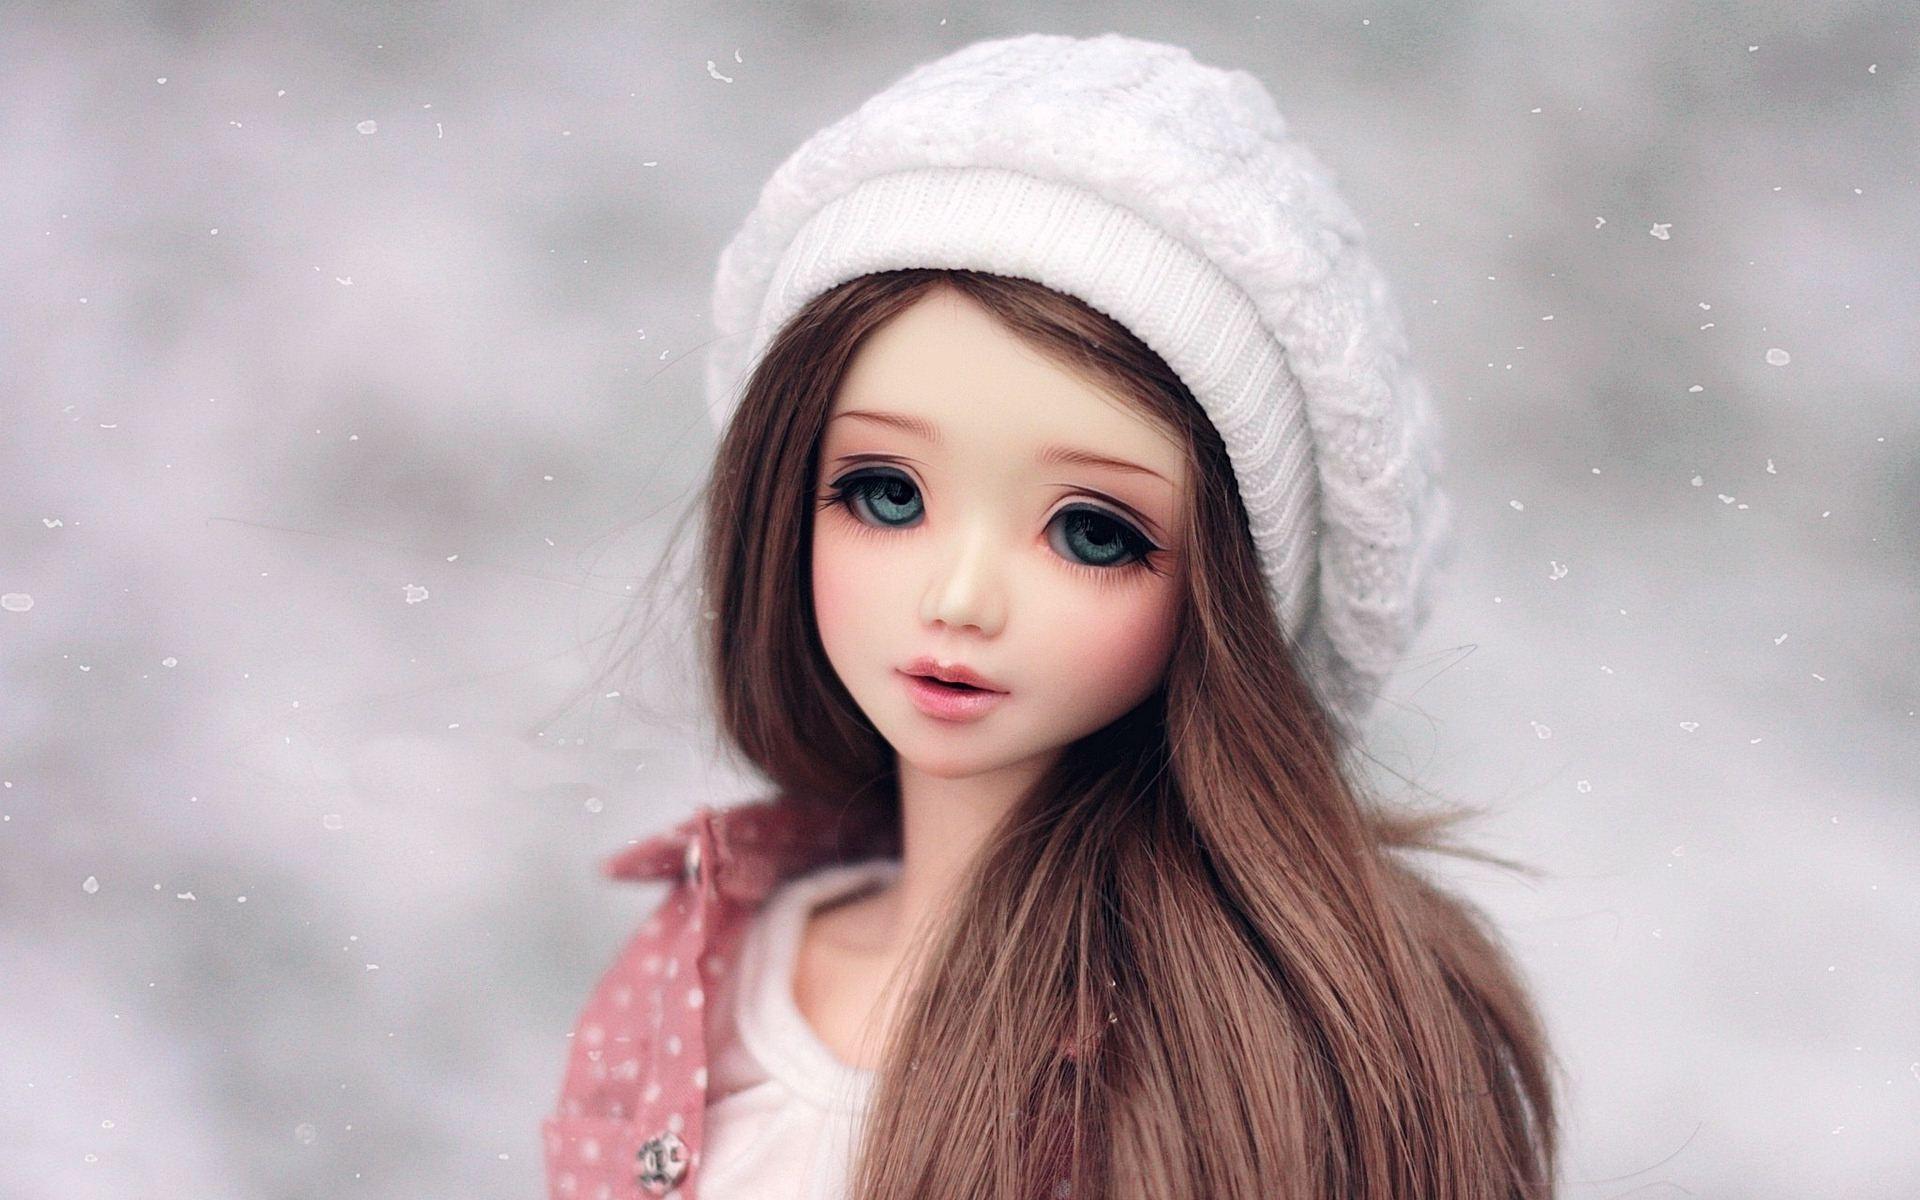 Long Hair Cute Barbie Doll in Winter Cap Full HD wallpaper Image Photo 1920x1200